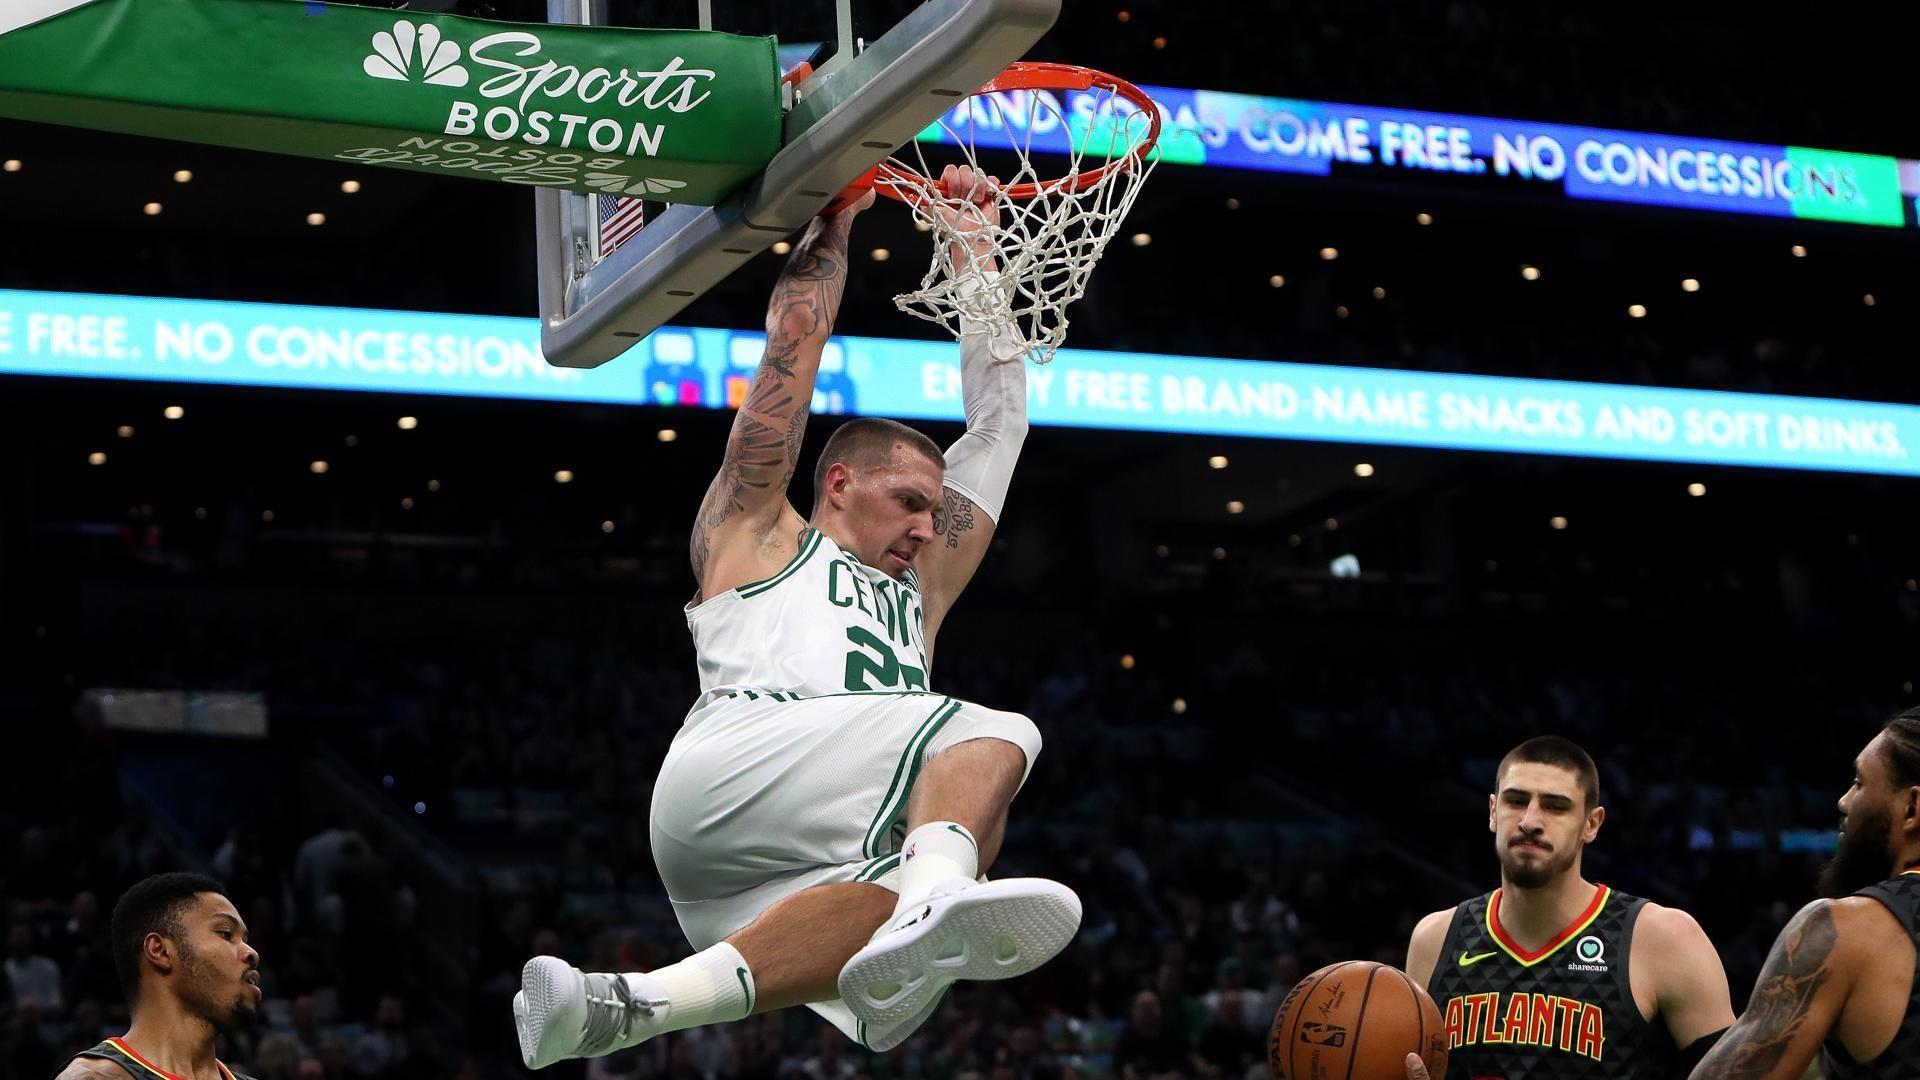 'It's fun out there.' Celtics' winning streak reaches